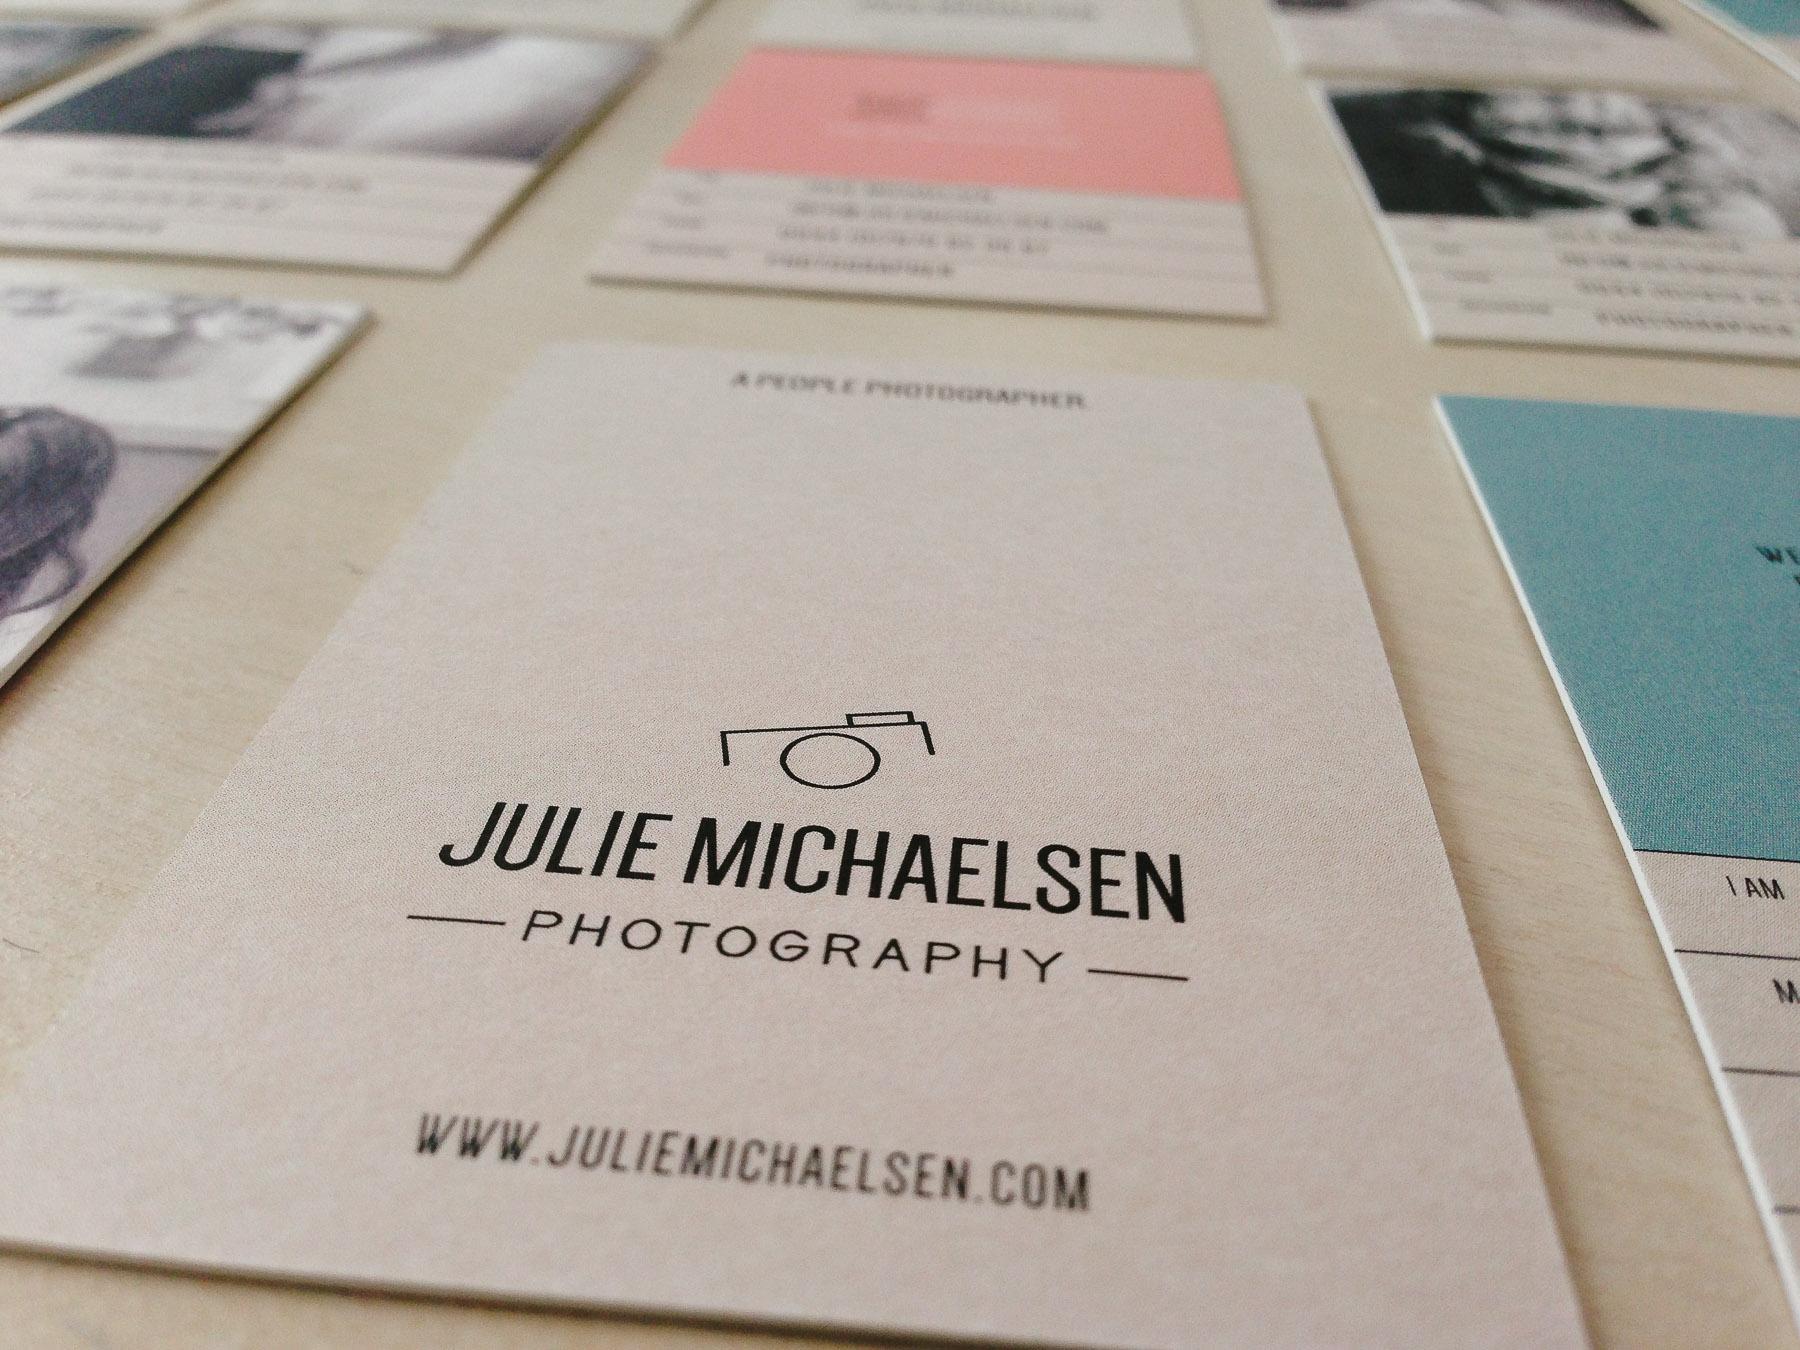 julie-michaelsen-photography-12.jpg